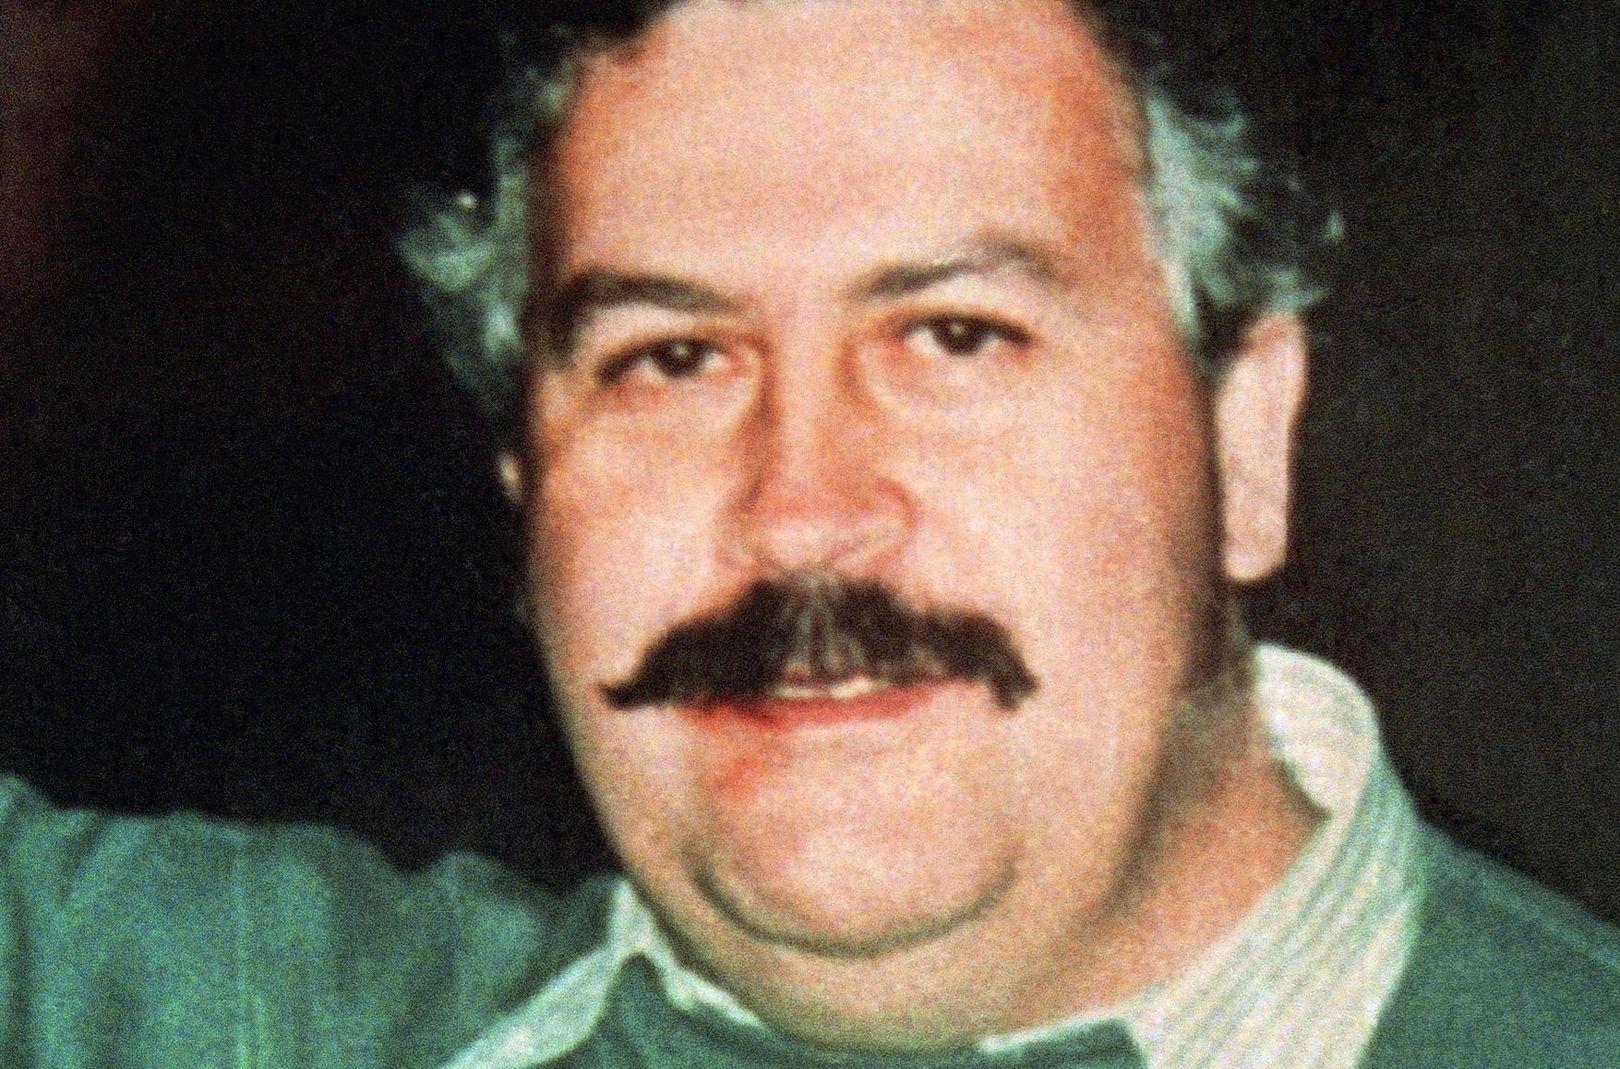 Pablo escobar death date in Perth